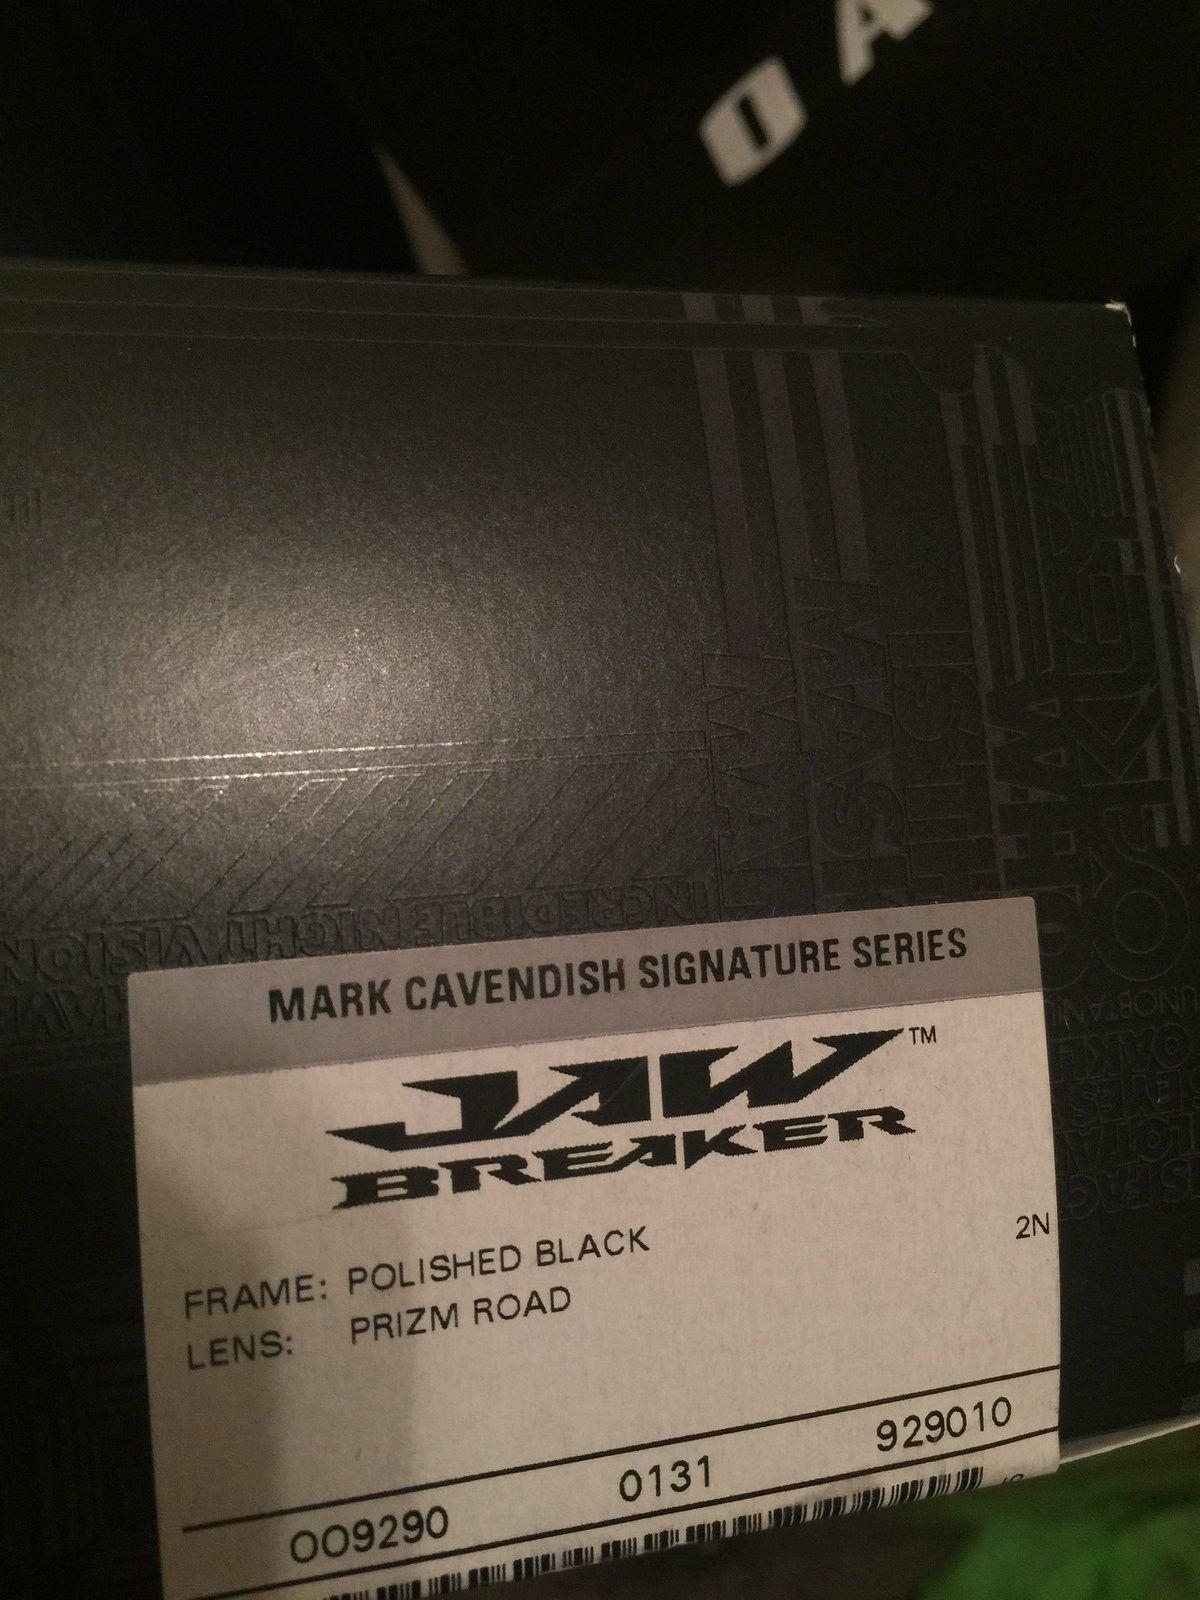 Cavendish Jawbreaker - image.jpg